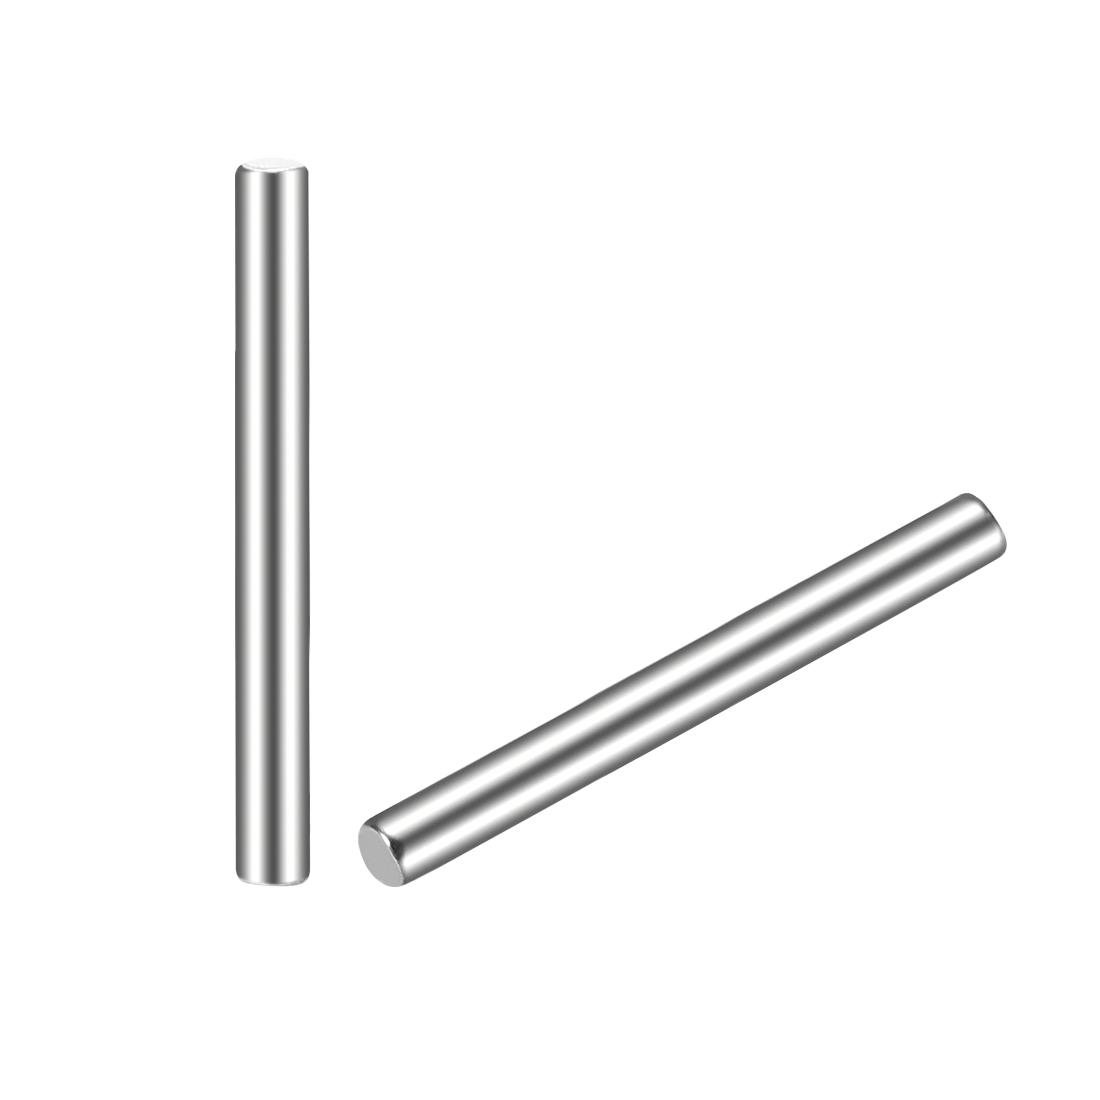 20Pcs 2mm x 20mm Dowel Pin 304 Stainless Steel Shelf Support Pin Fasten